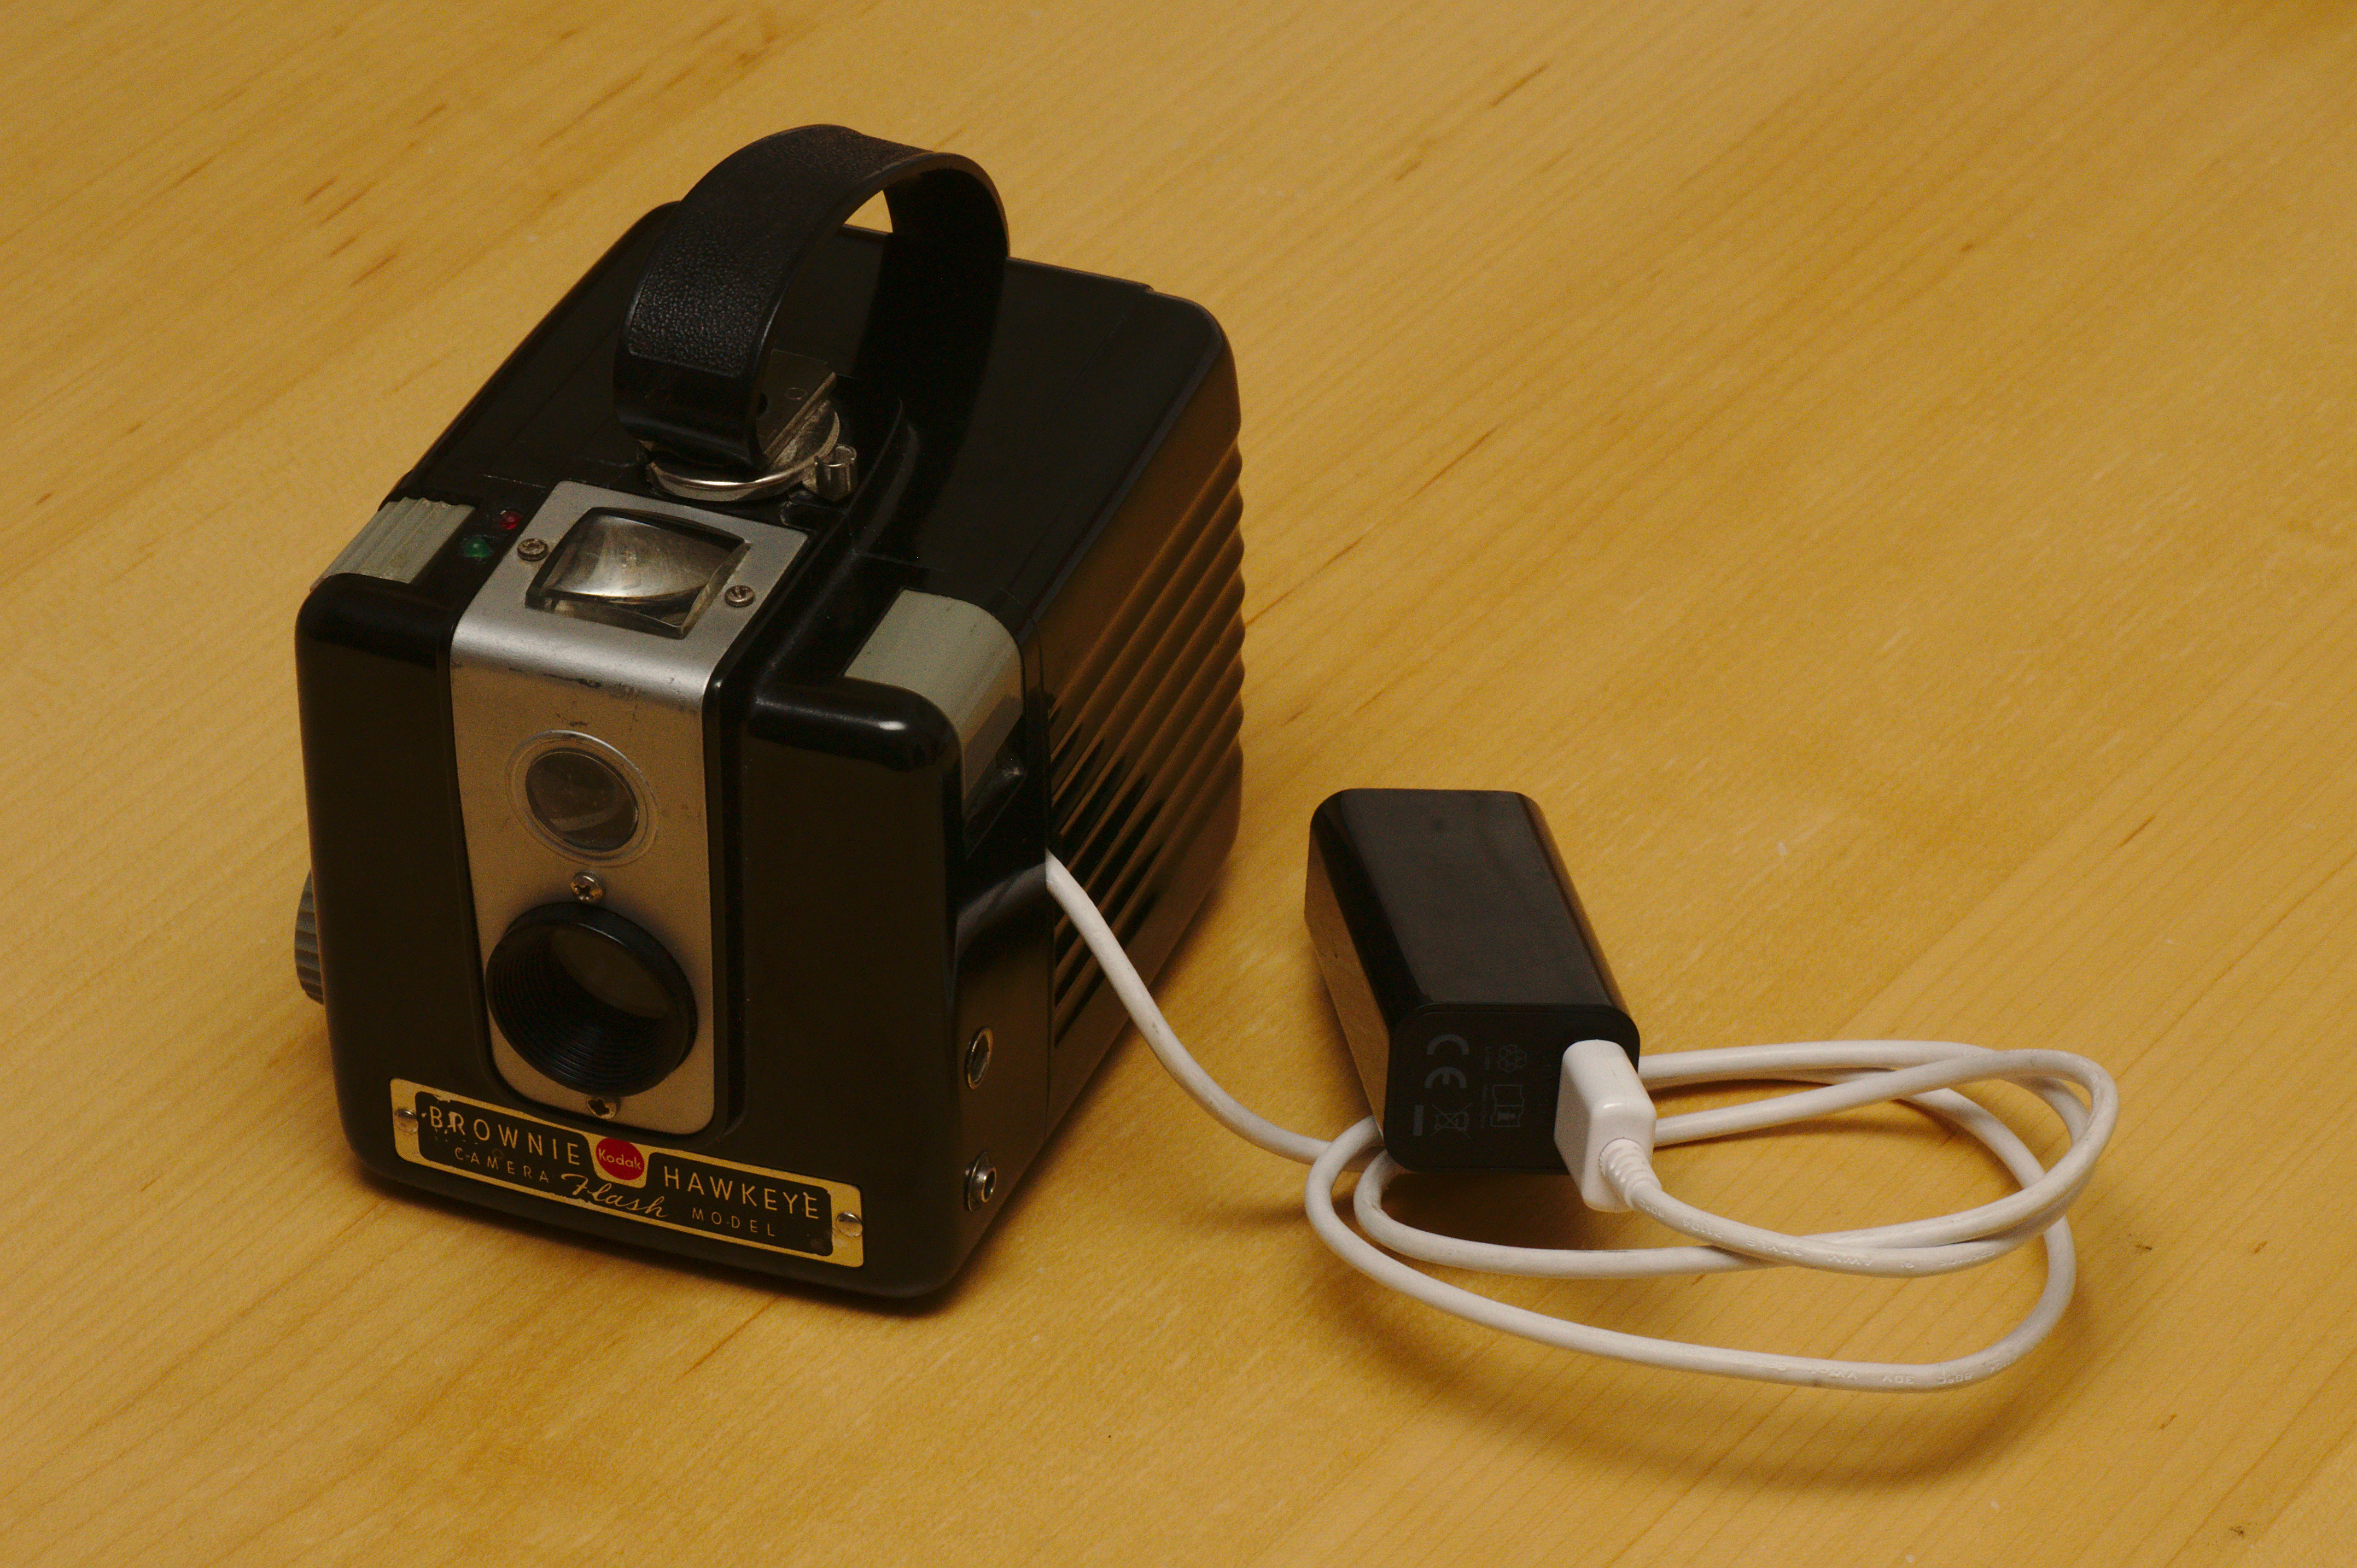 Converting a Kodak Box Brownie into a digital camera